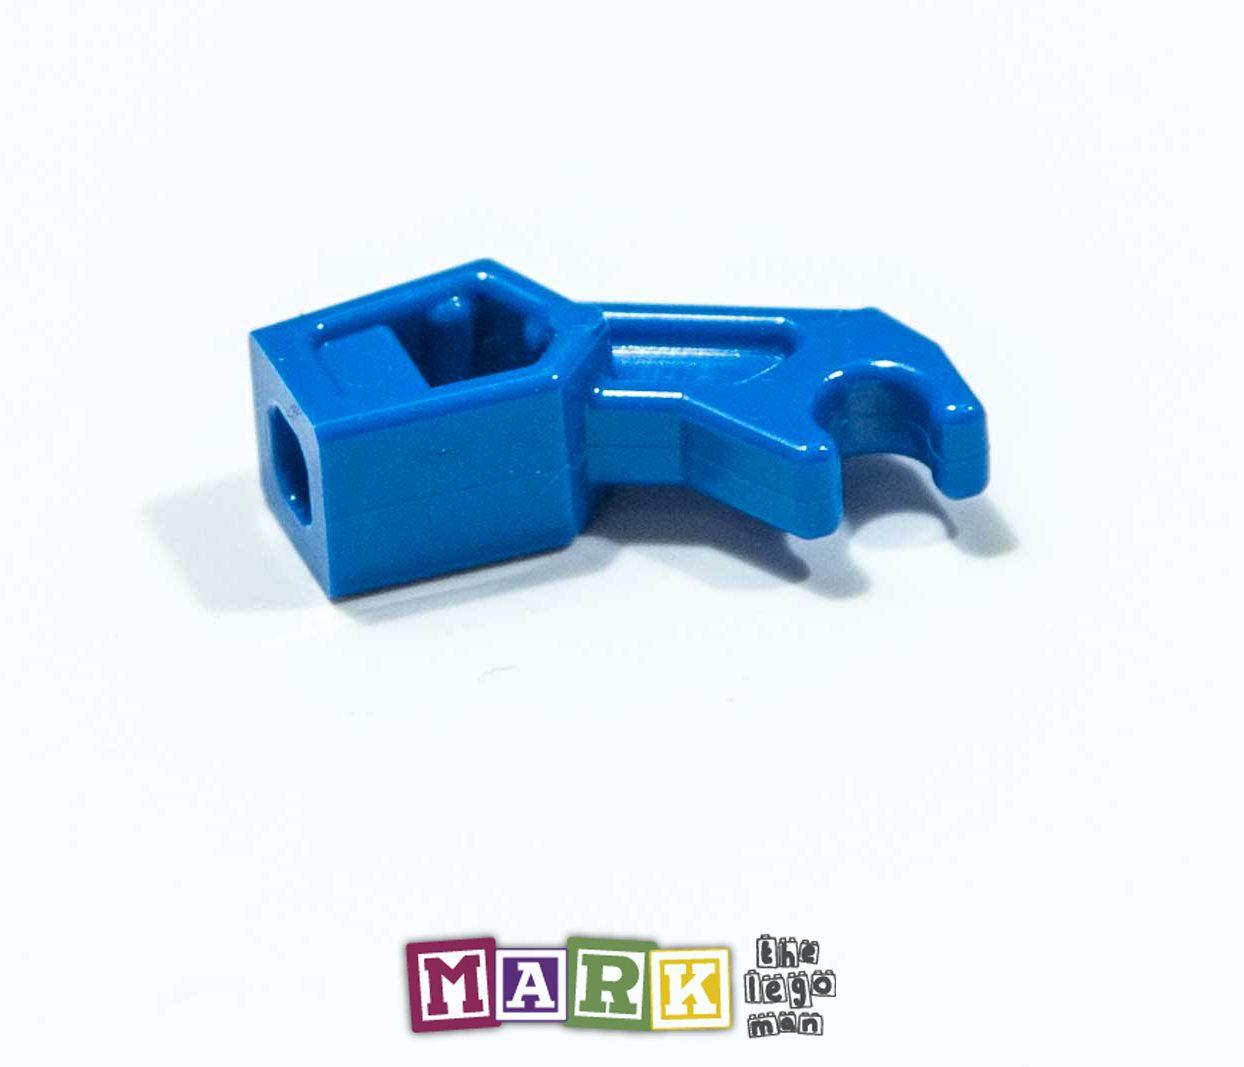 New Lego 76116 Bad Robot Arm 6014032